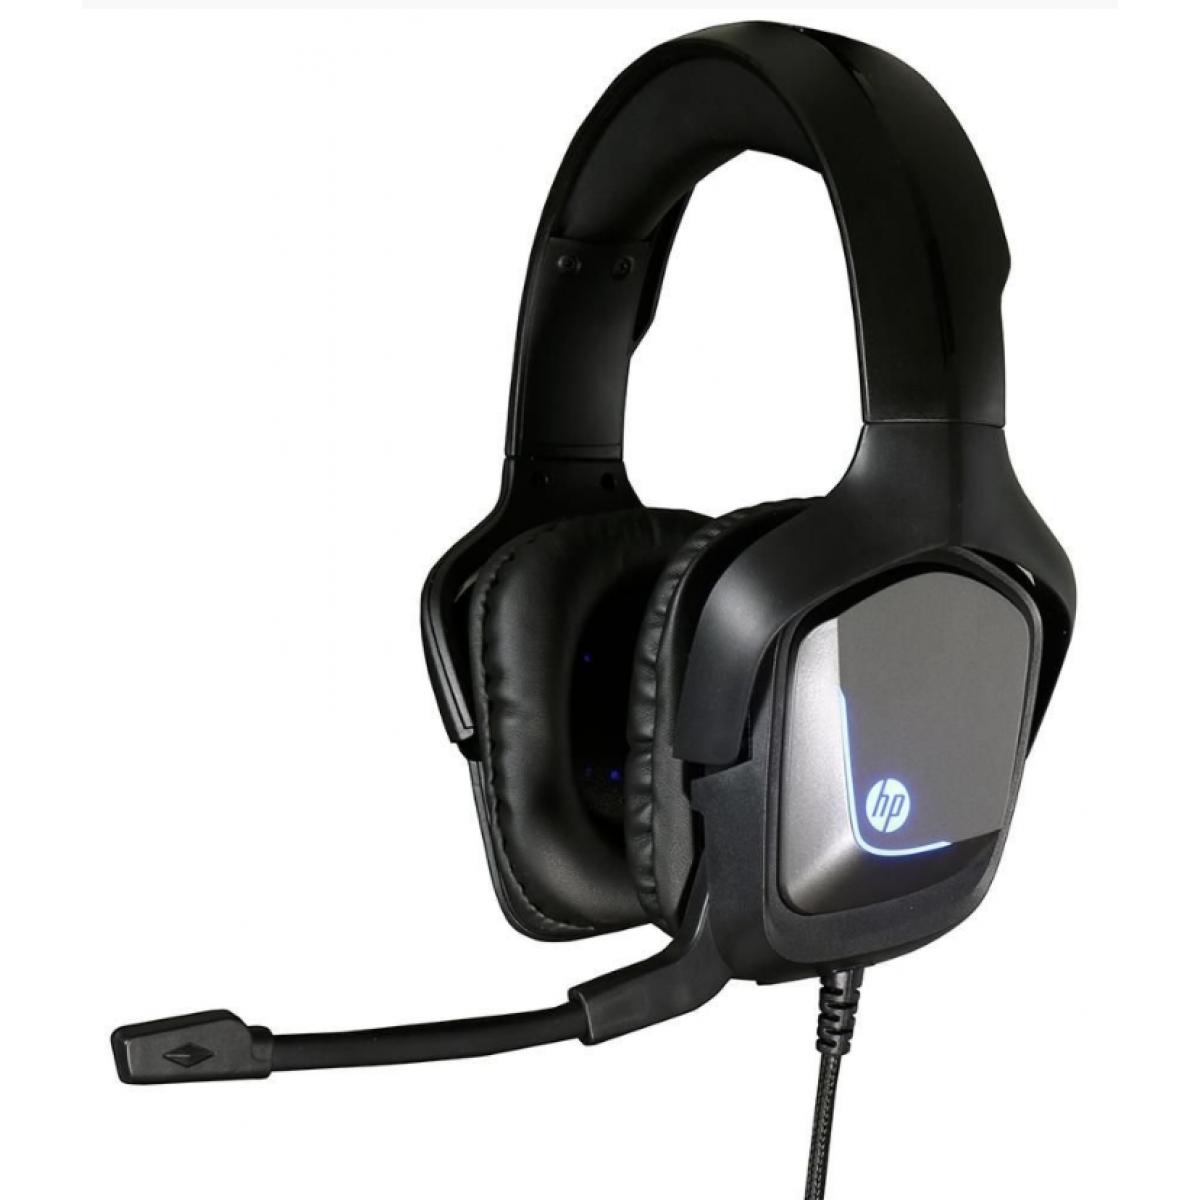 Headset Gamer HP  H220, Com Fio, USB + P2, Black